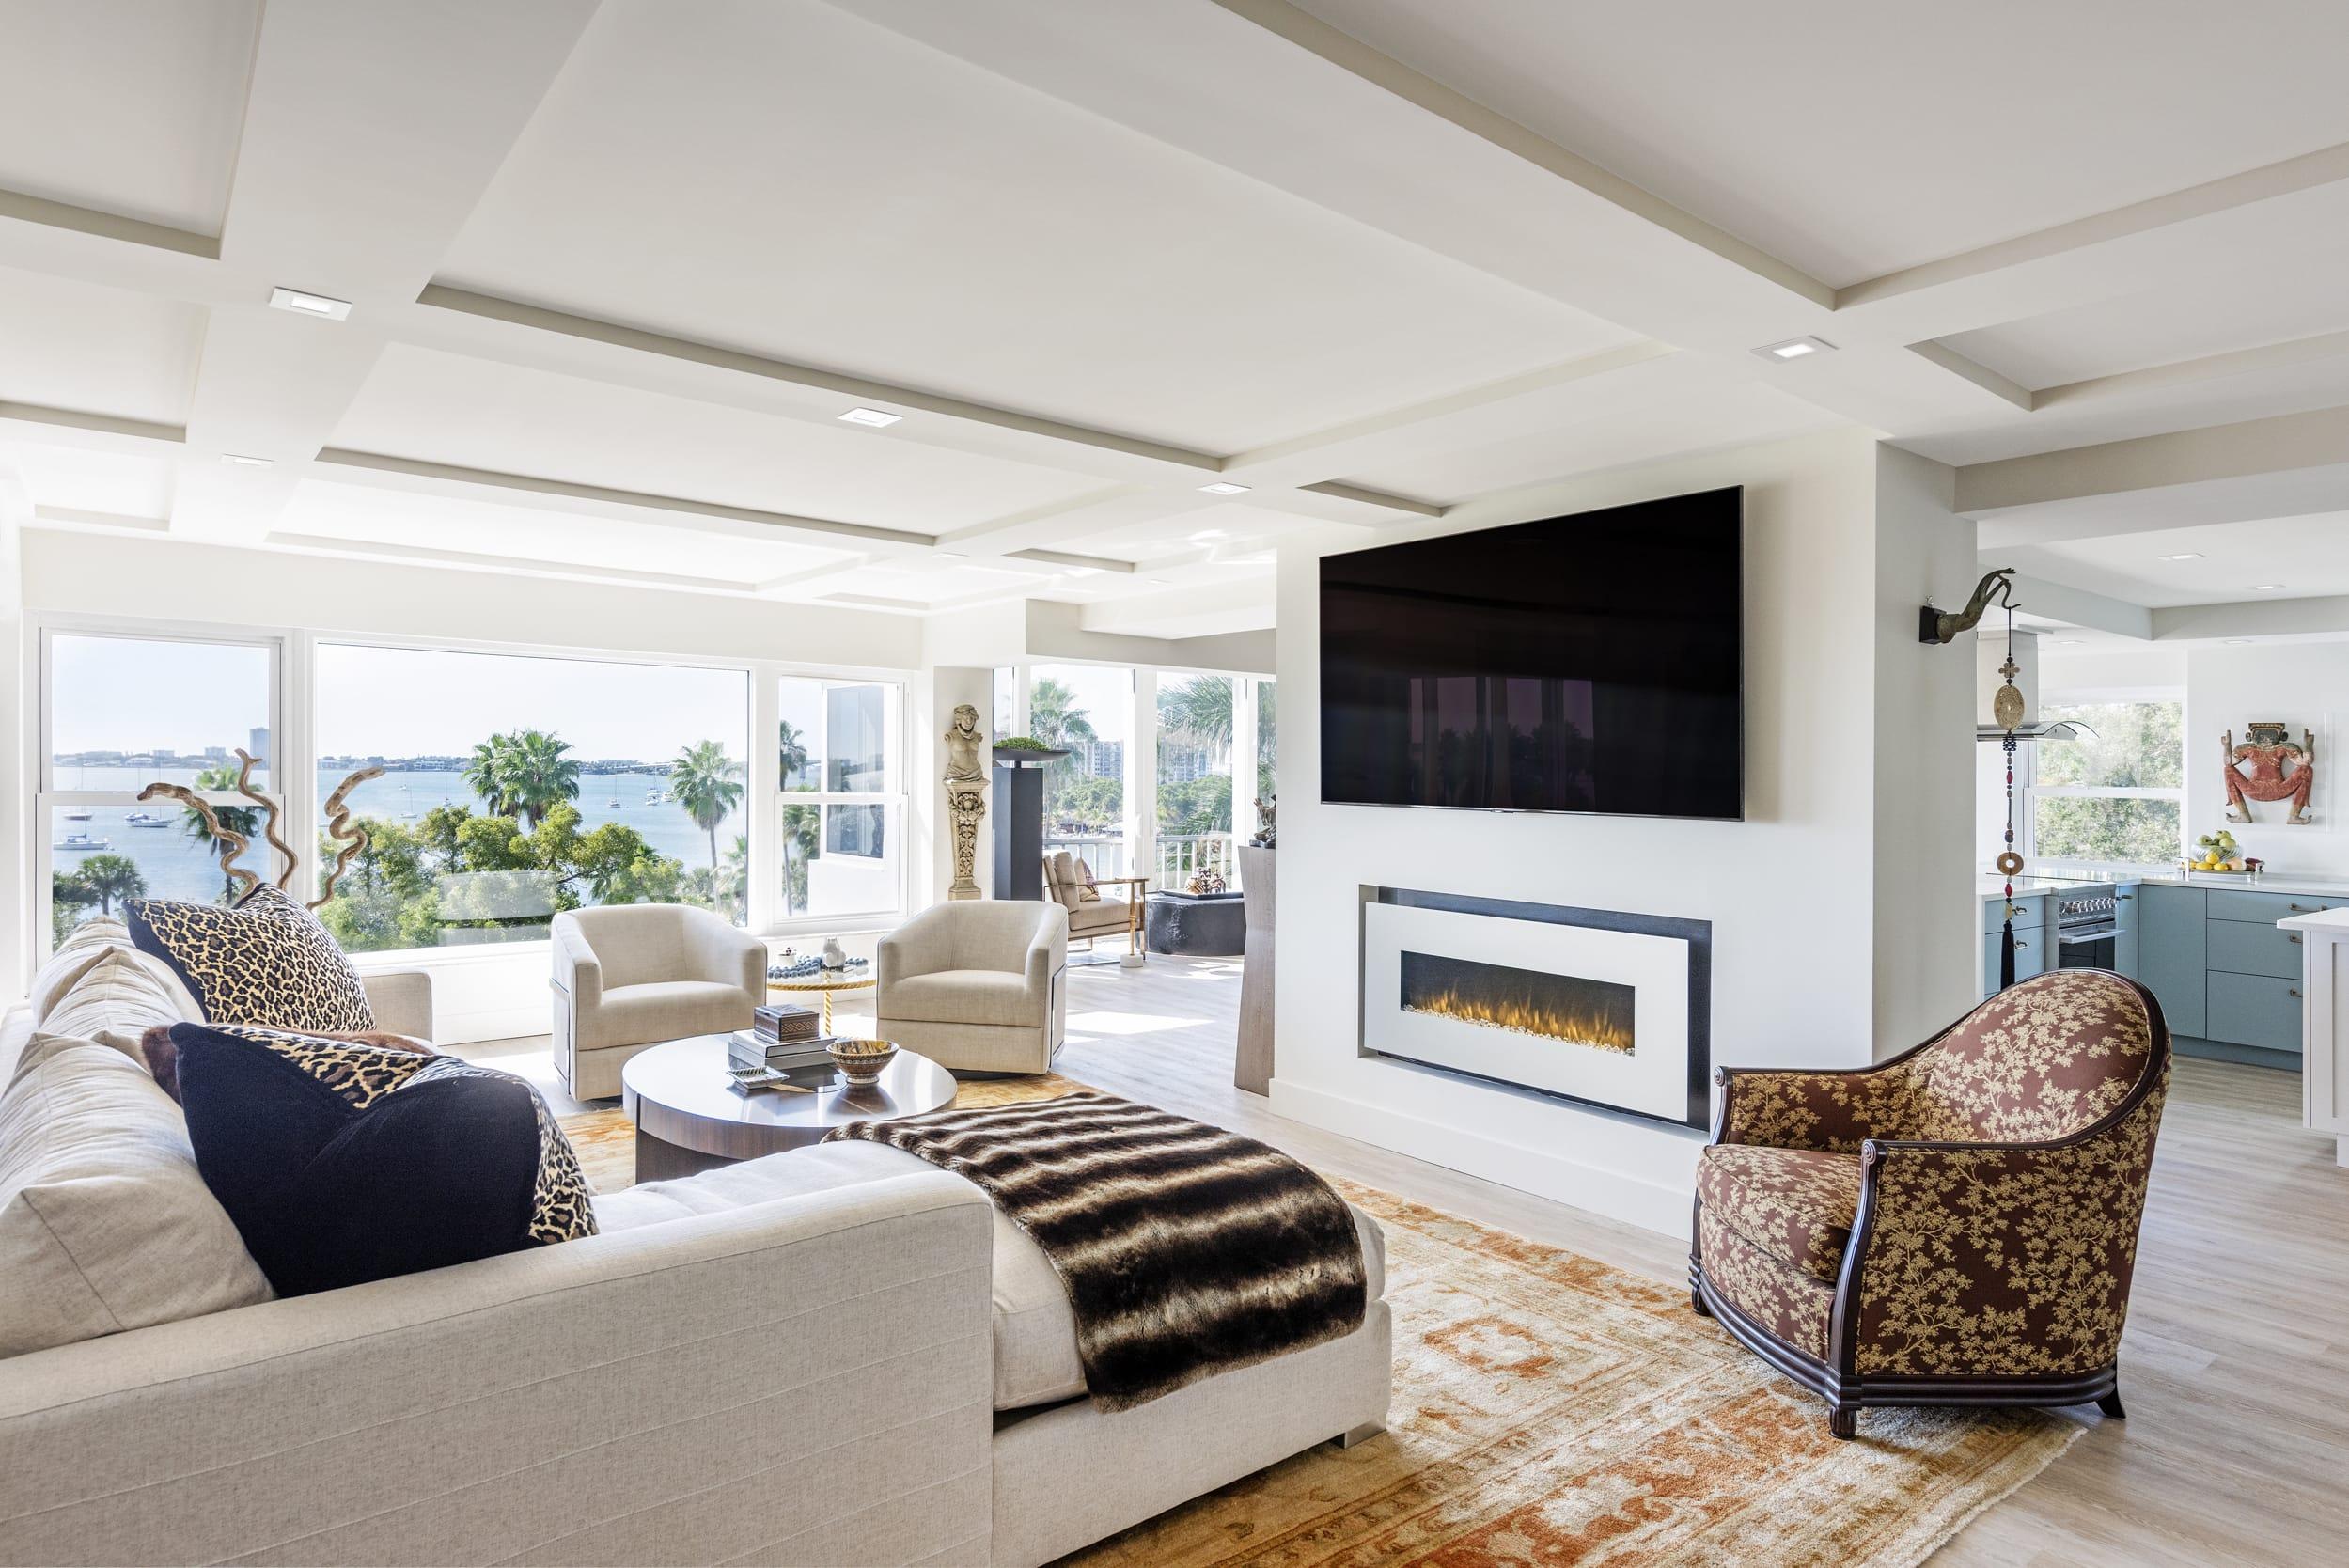 Coastal View Cultural Memento Livingroom Leopard Print Pillows Fire Display